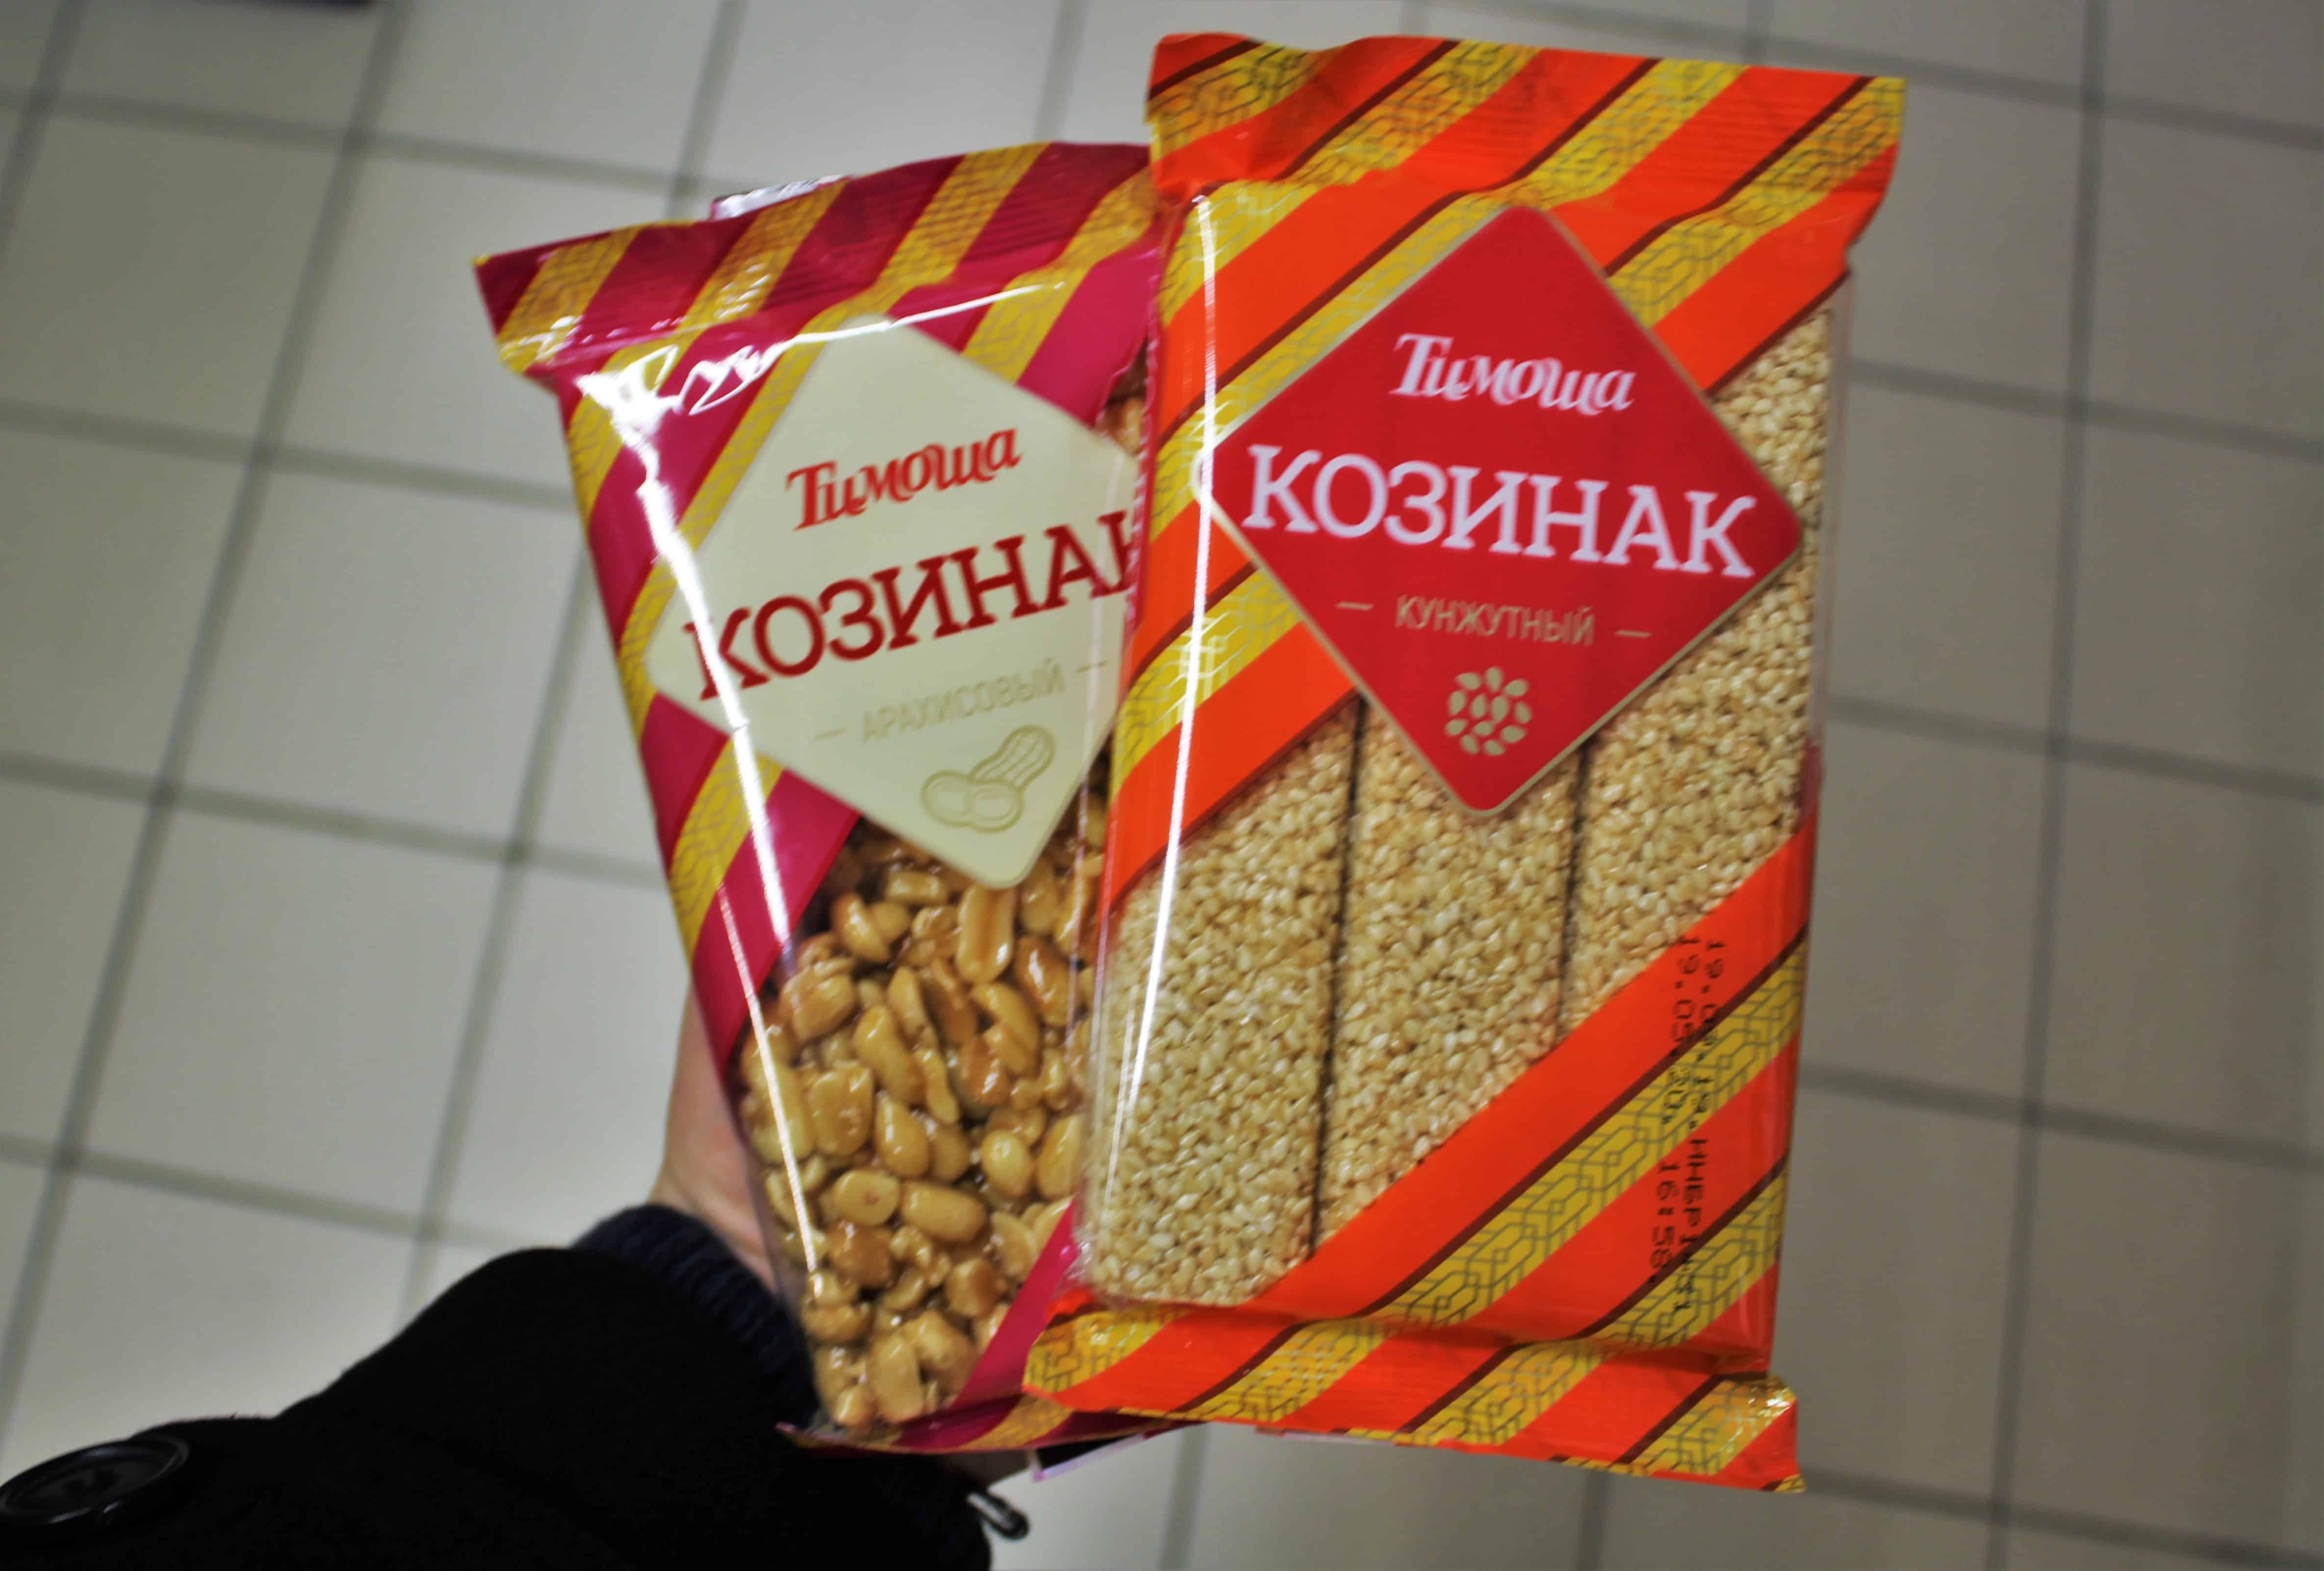 koziniak